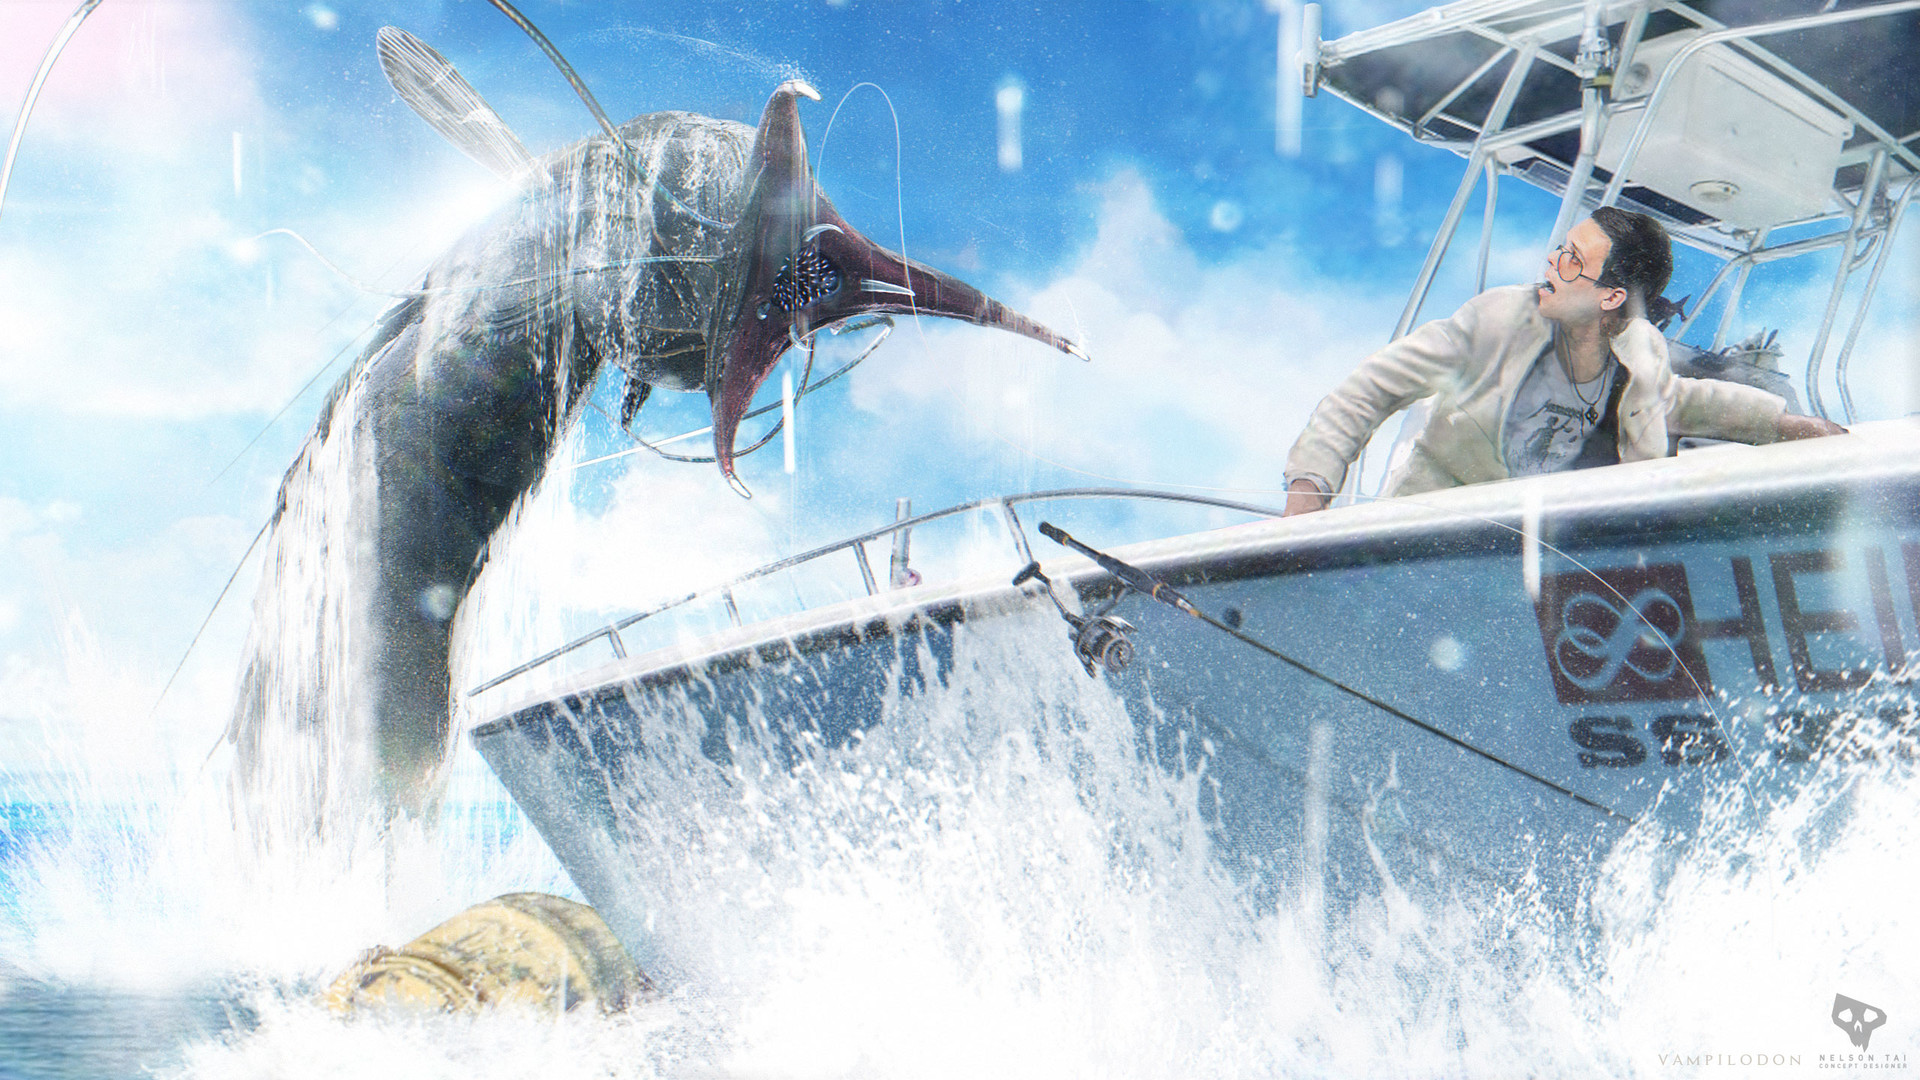 Nelson tai eel dsgn fishinga 001a